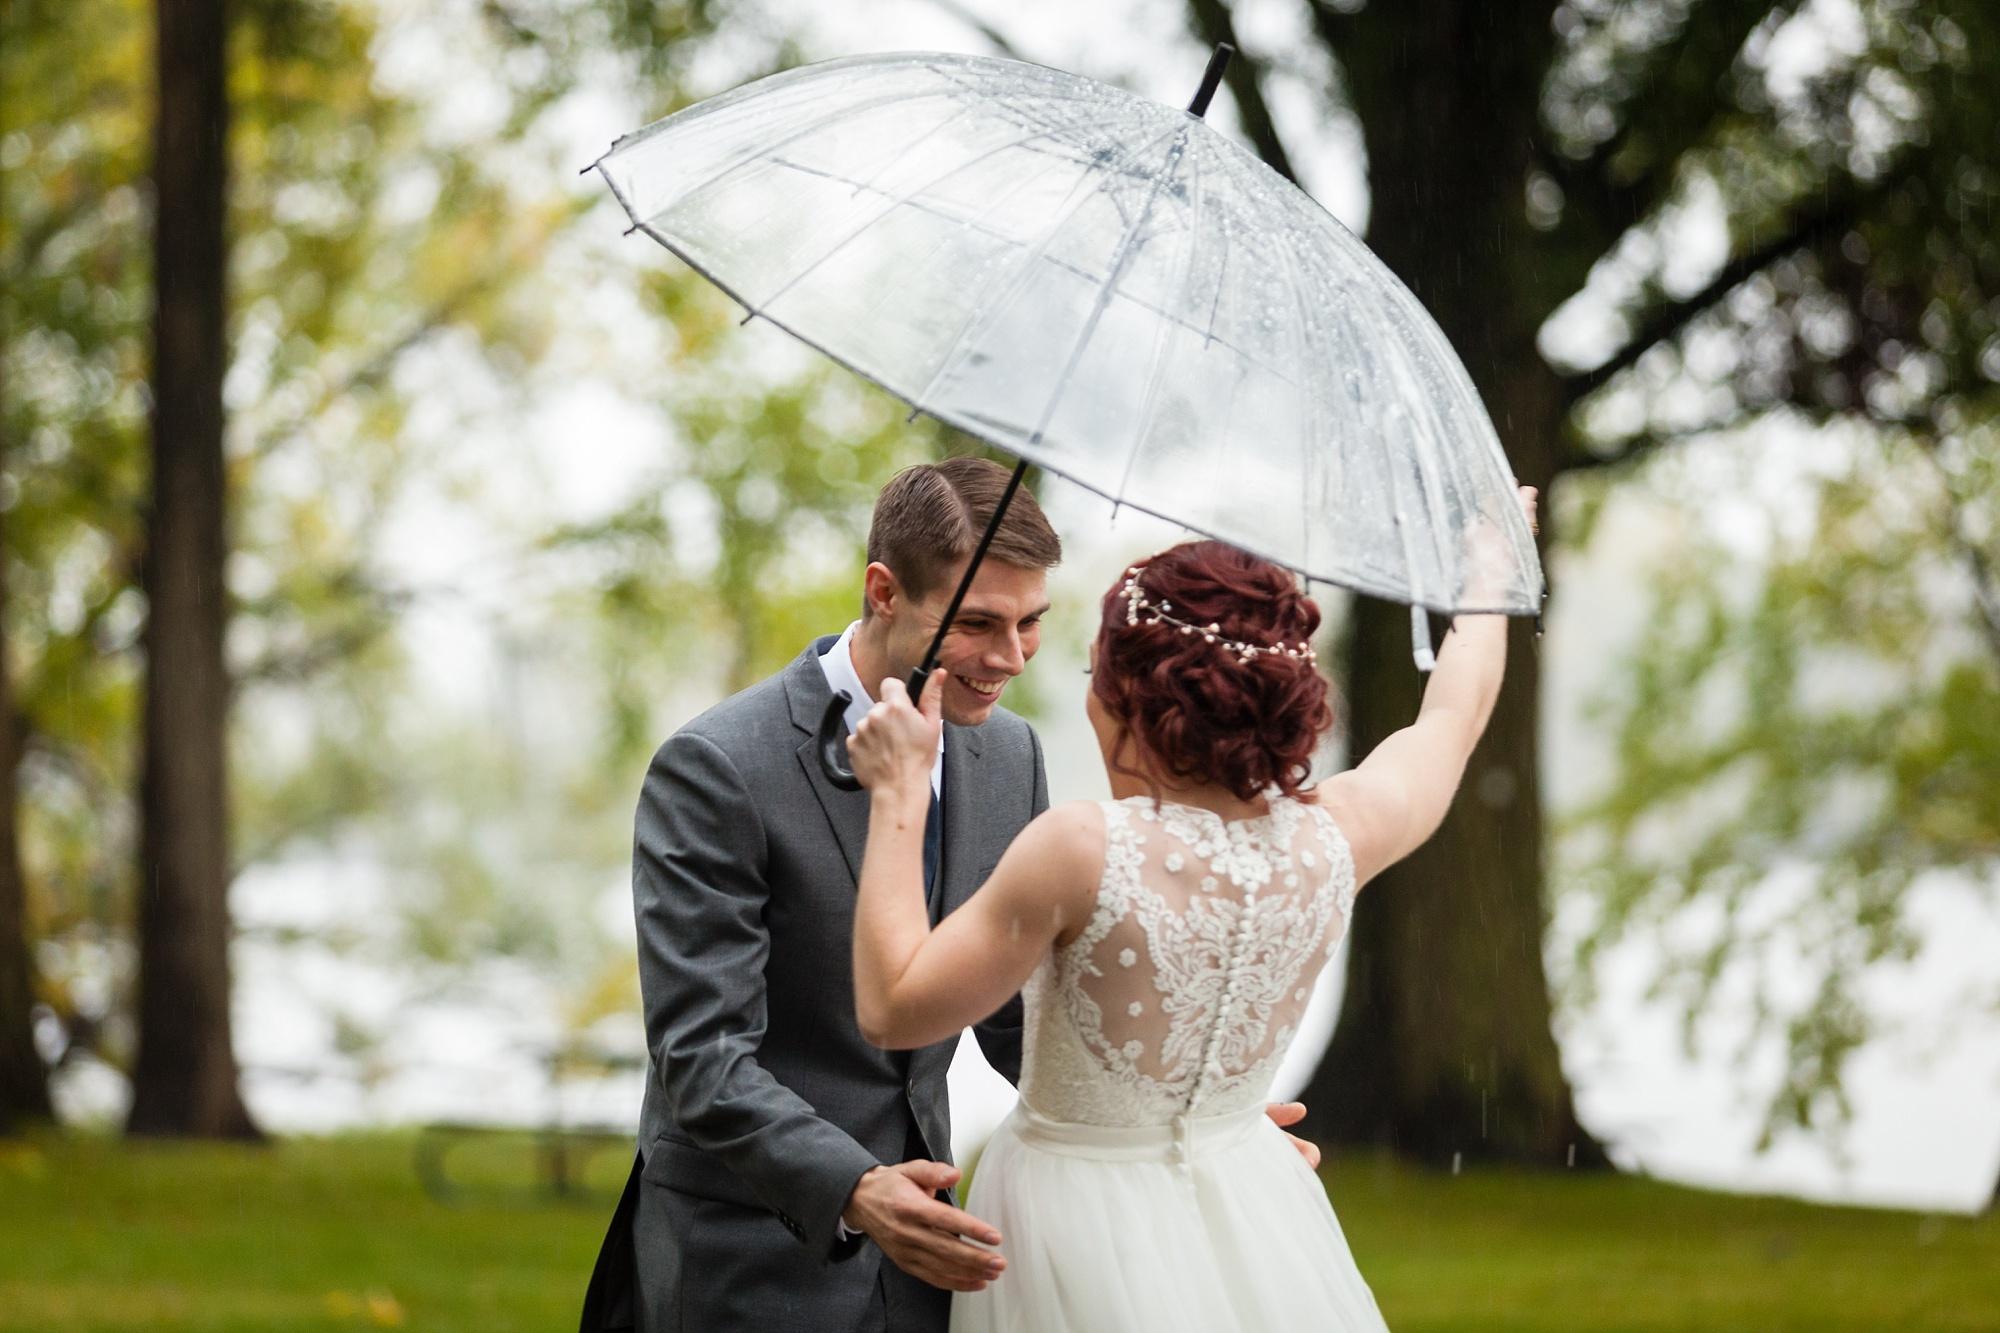 Brandon_Shafer_Photography_Lauren_Ethan_New_Vintage_Place_Grand_Rapids_Wedding_0020.jpg